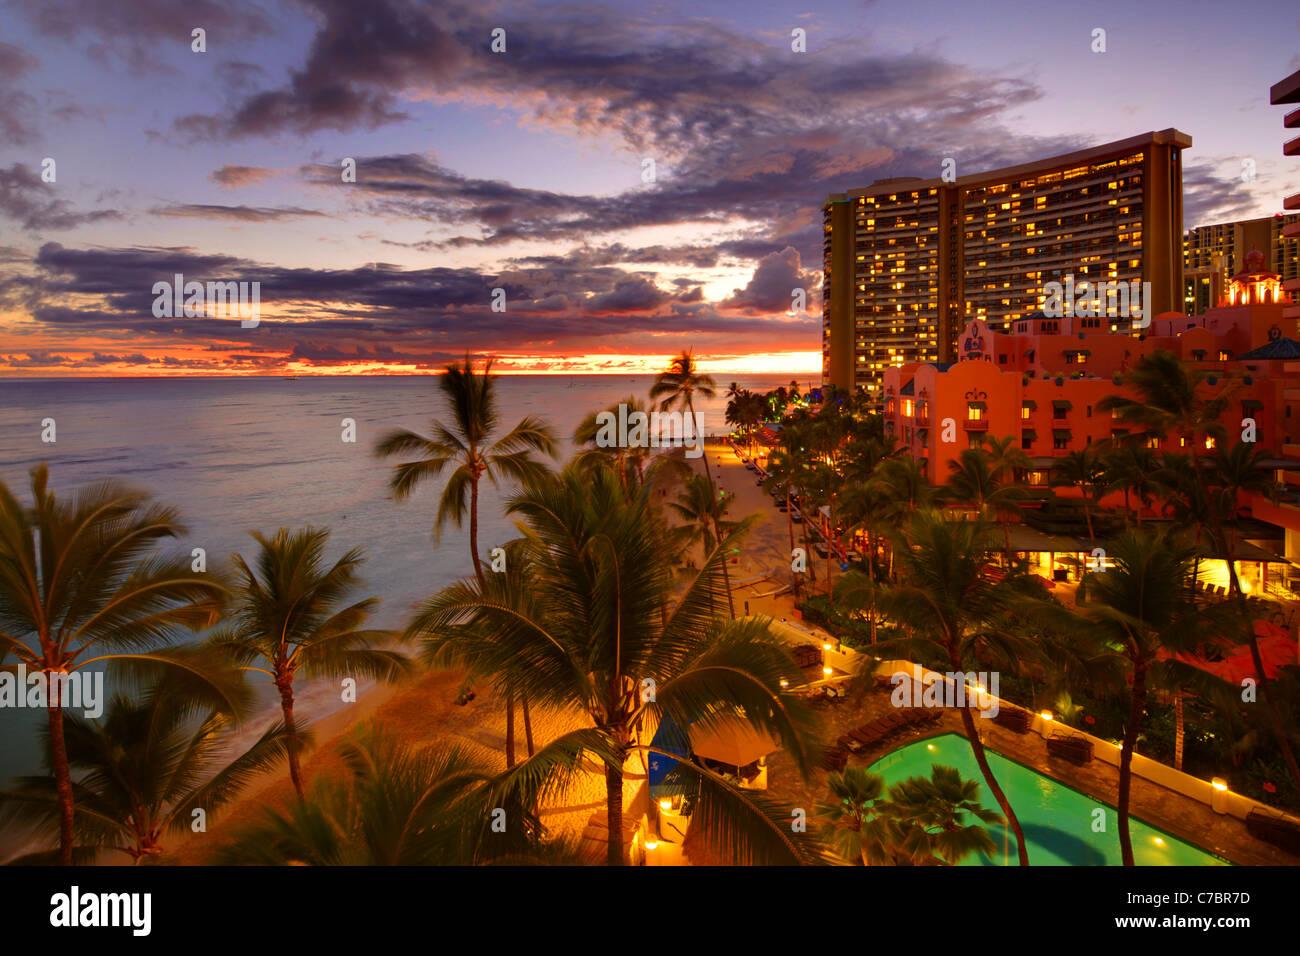 Twilight, Waikiki, Oahu, Hawaii - Stock Image